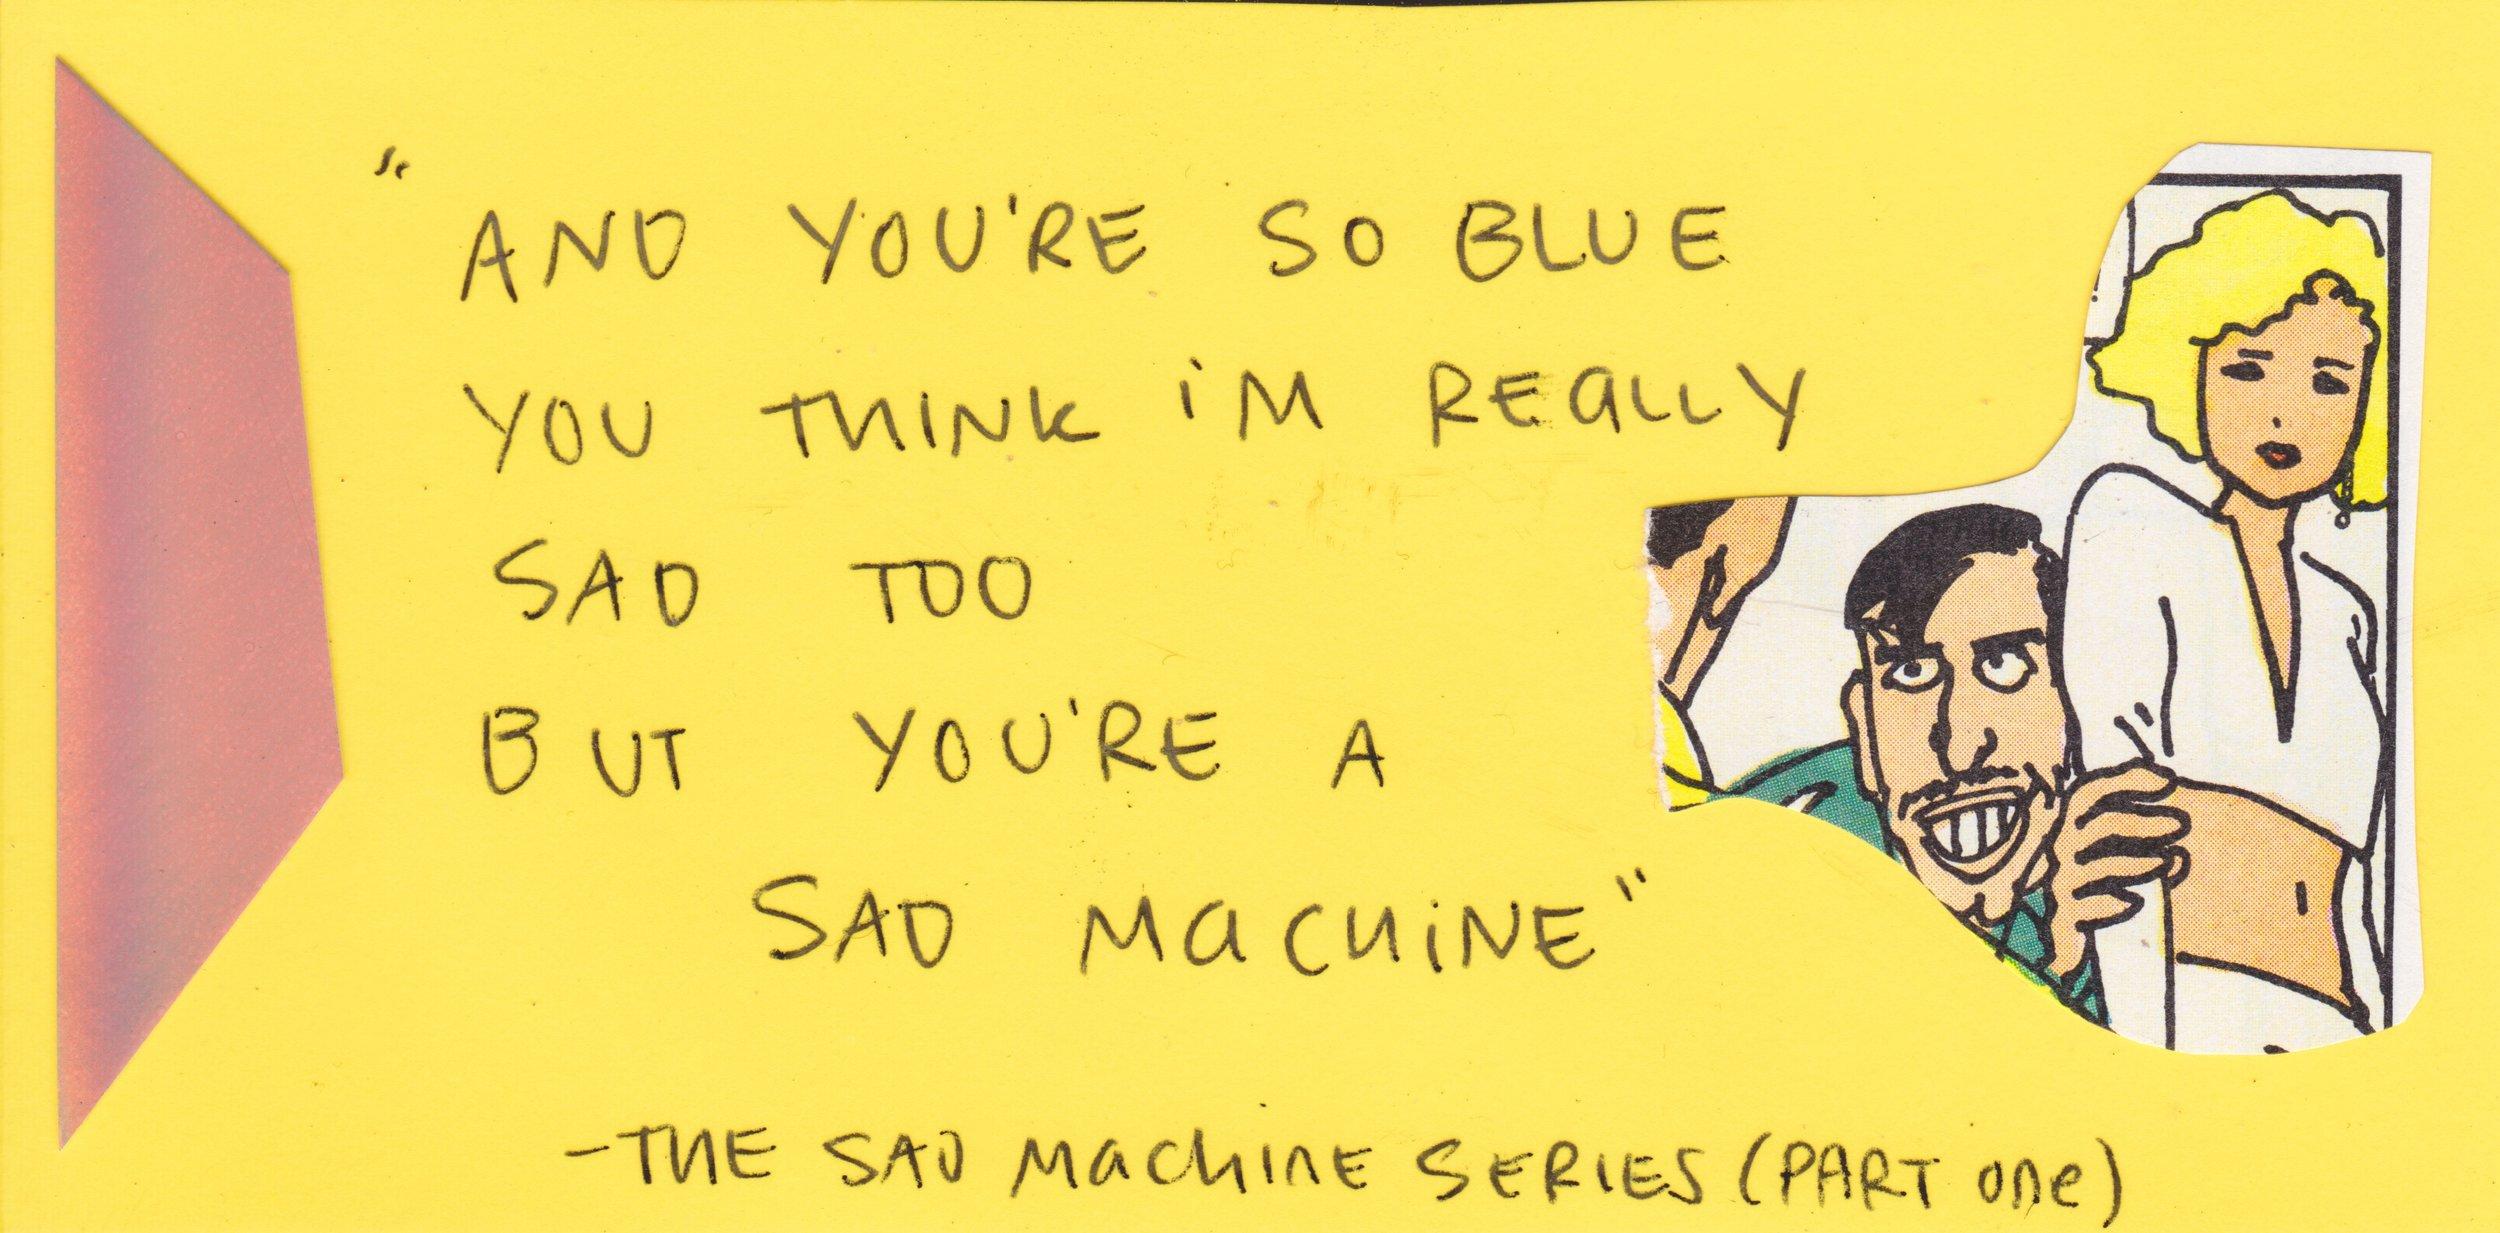 Sad Machine Series Quotes 10.jpeg